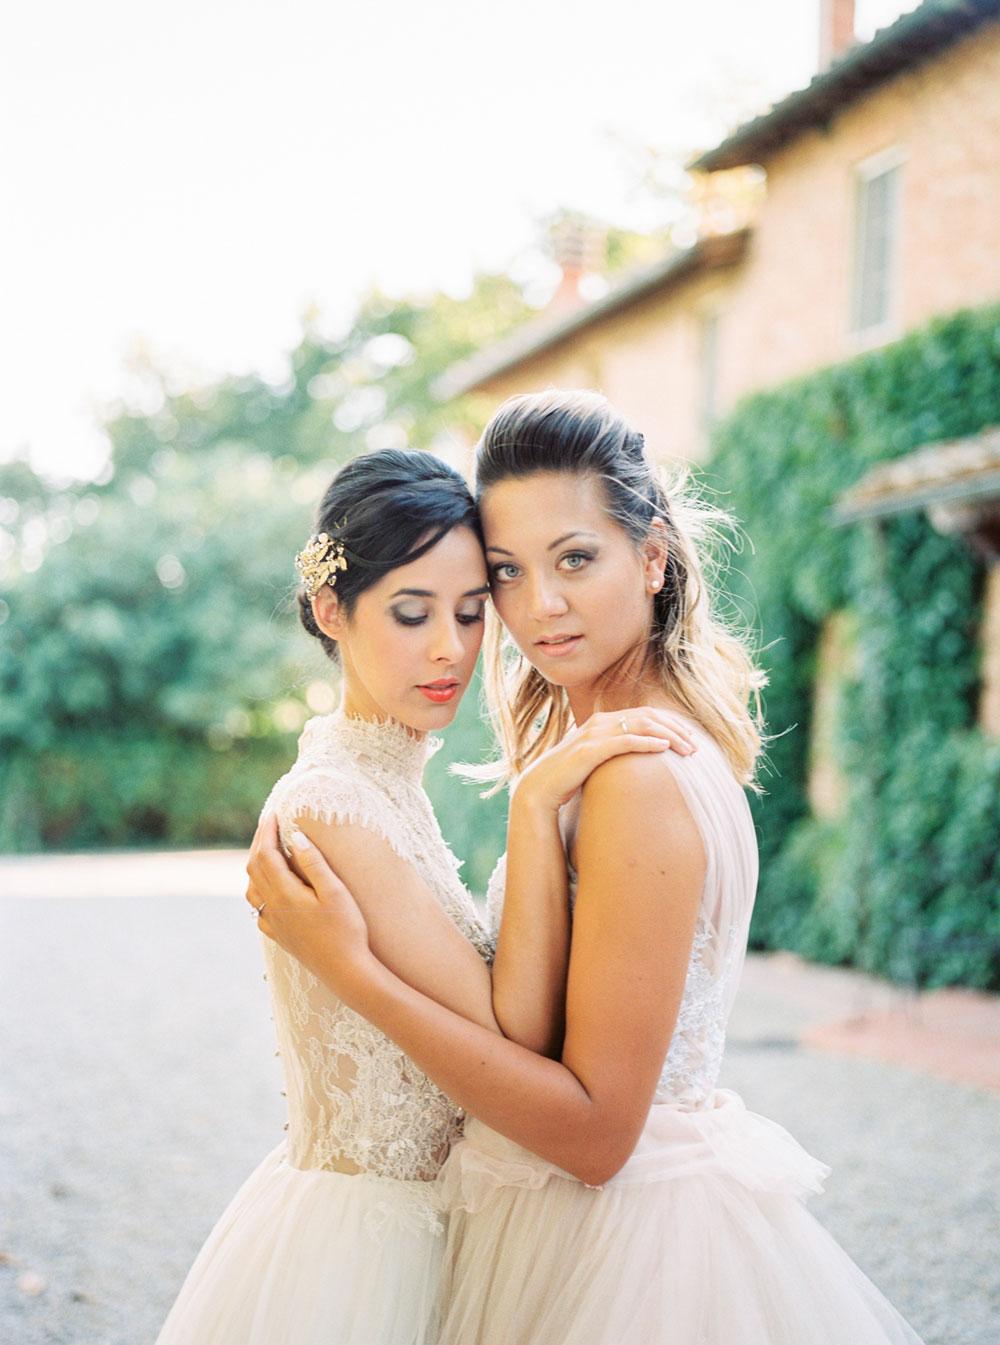 Linari-Tuscany-Elopement-Courtney-Michaela-156